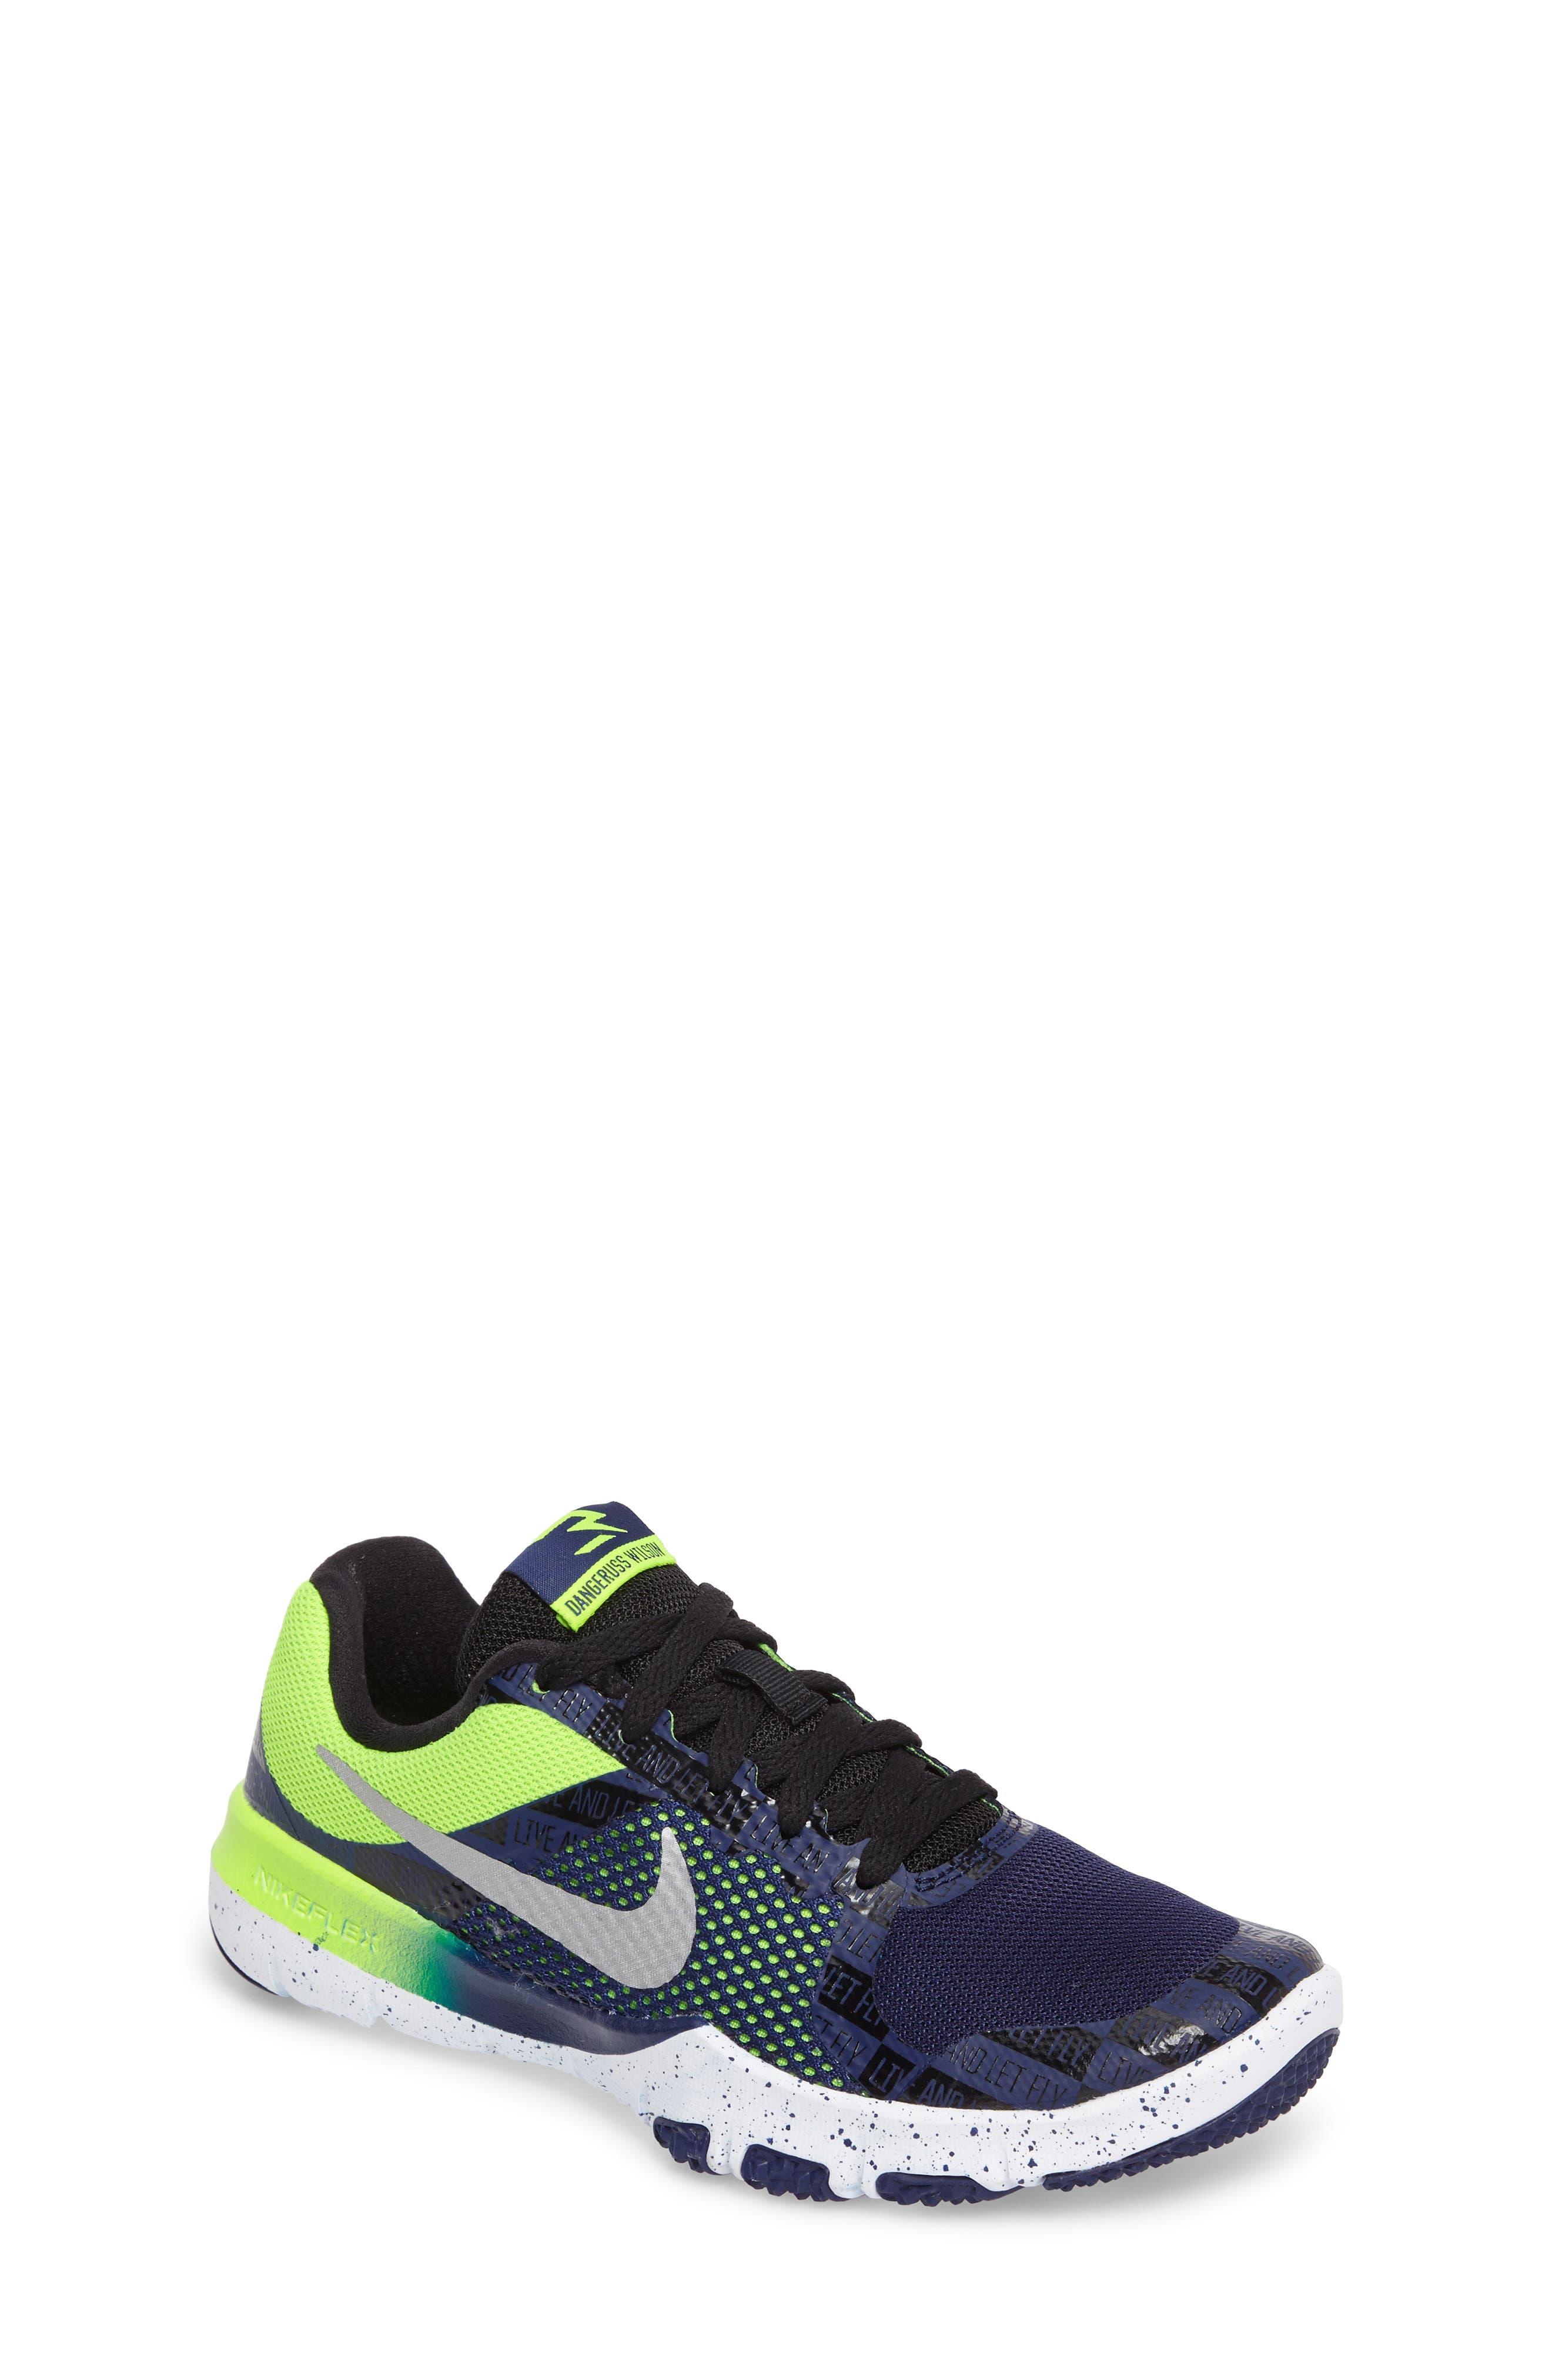 Main Image - Nike Flex TR Control Training Shoe (Toddler, Little Kid & Big Kid)